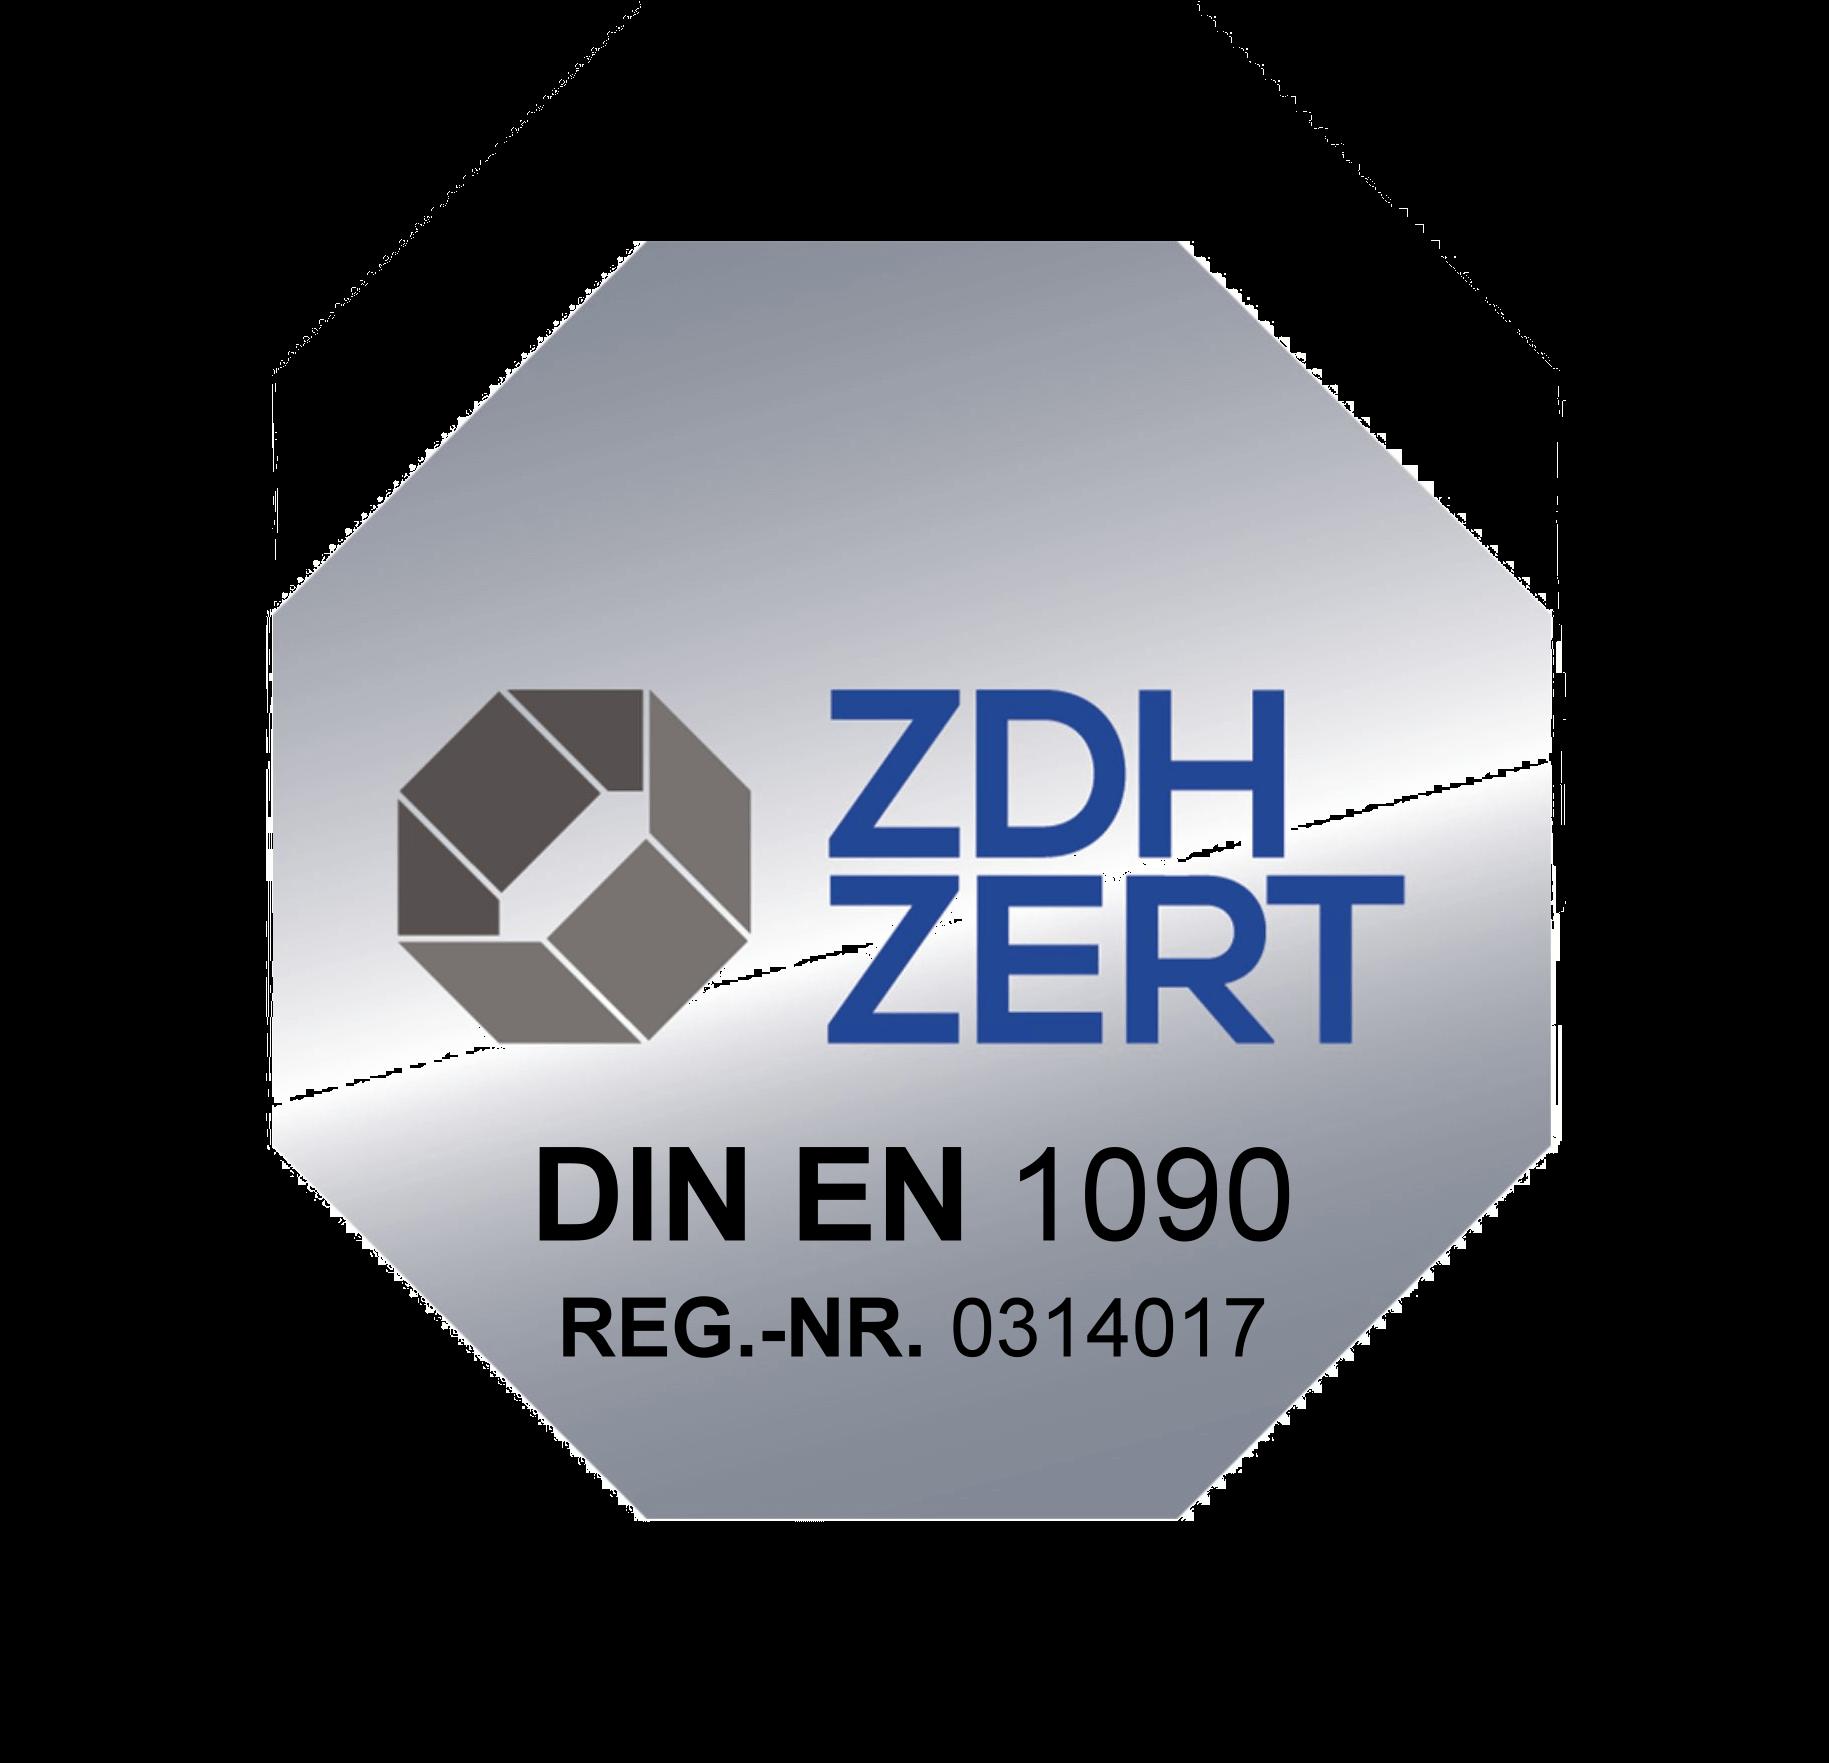 ZDH-ZERT DIN EN 1090